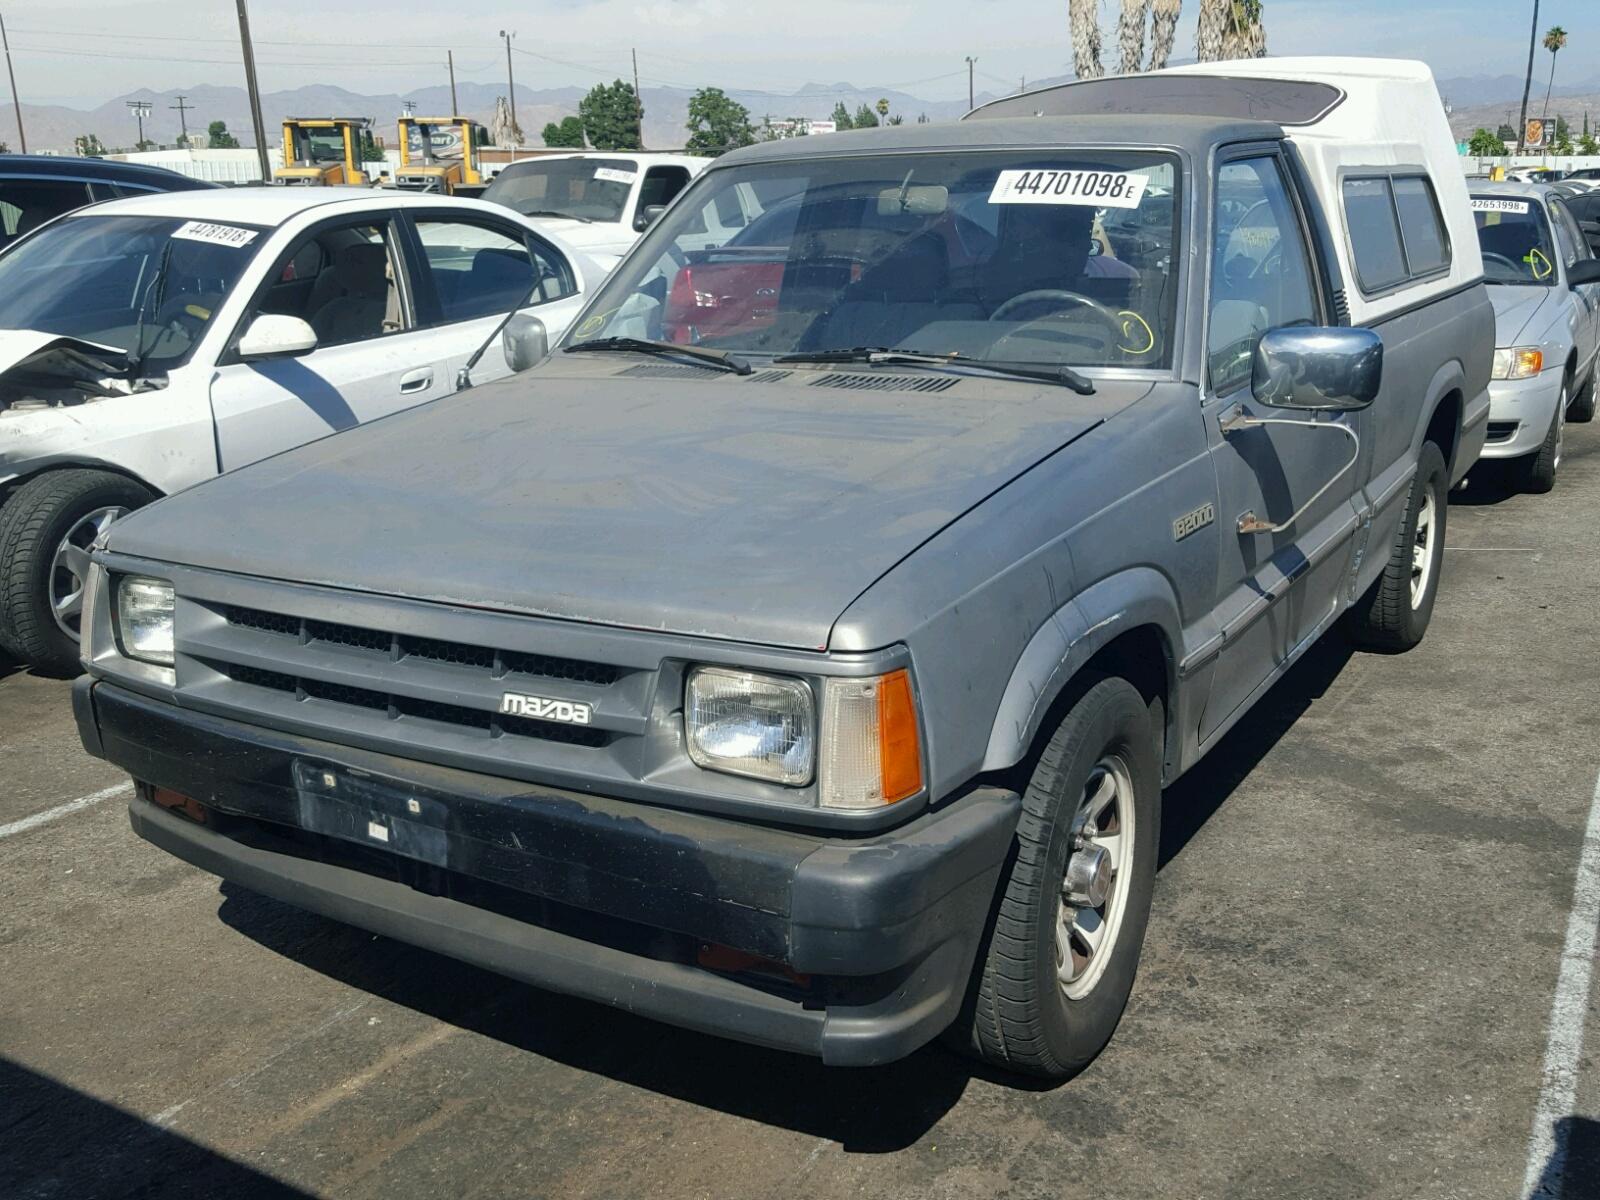 JM2UF1118G0518716   1986 GRAY MAZDA B2000 on Sale in CA - VAN NUYS ...